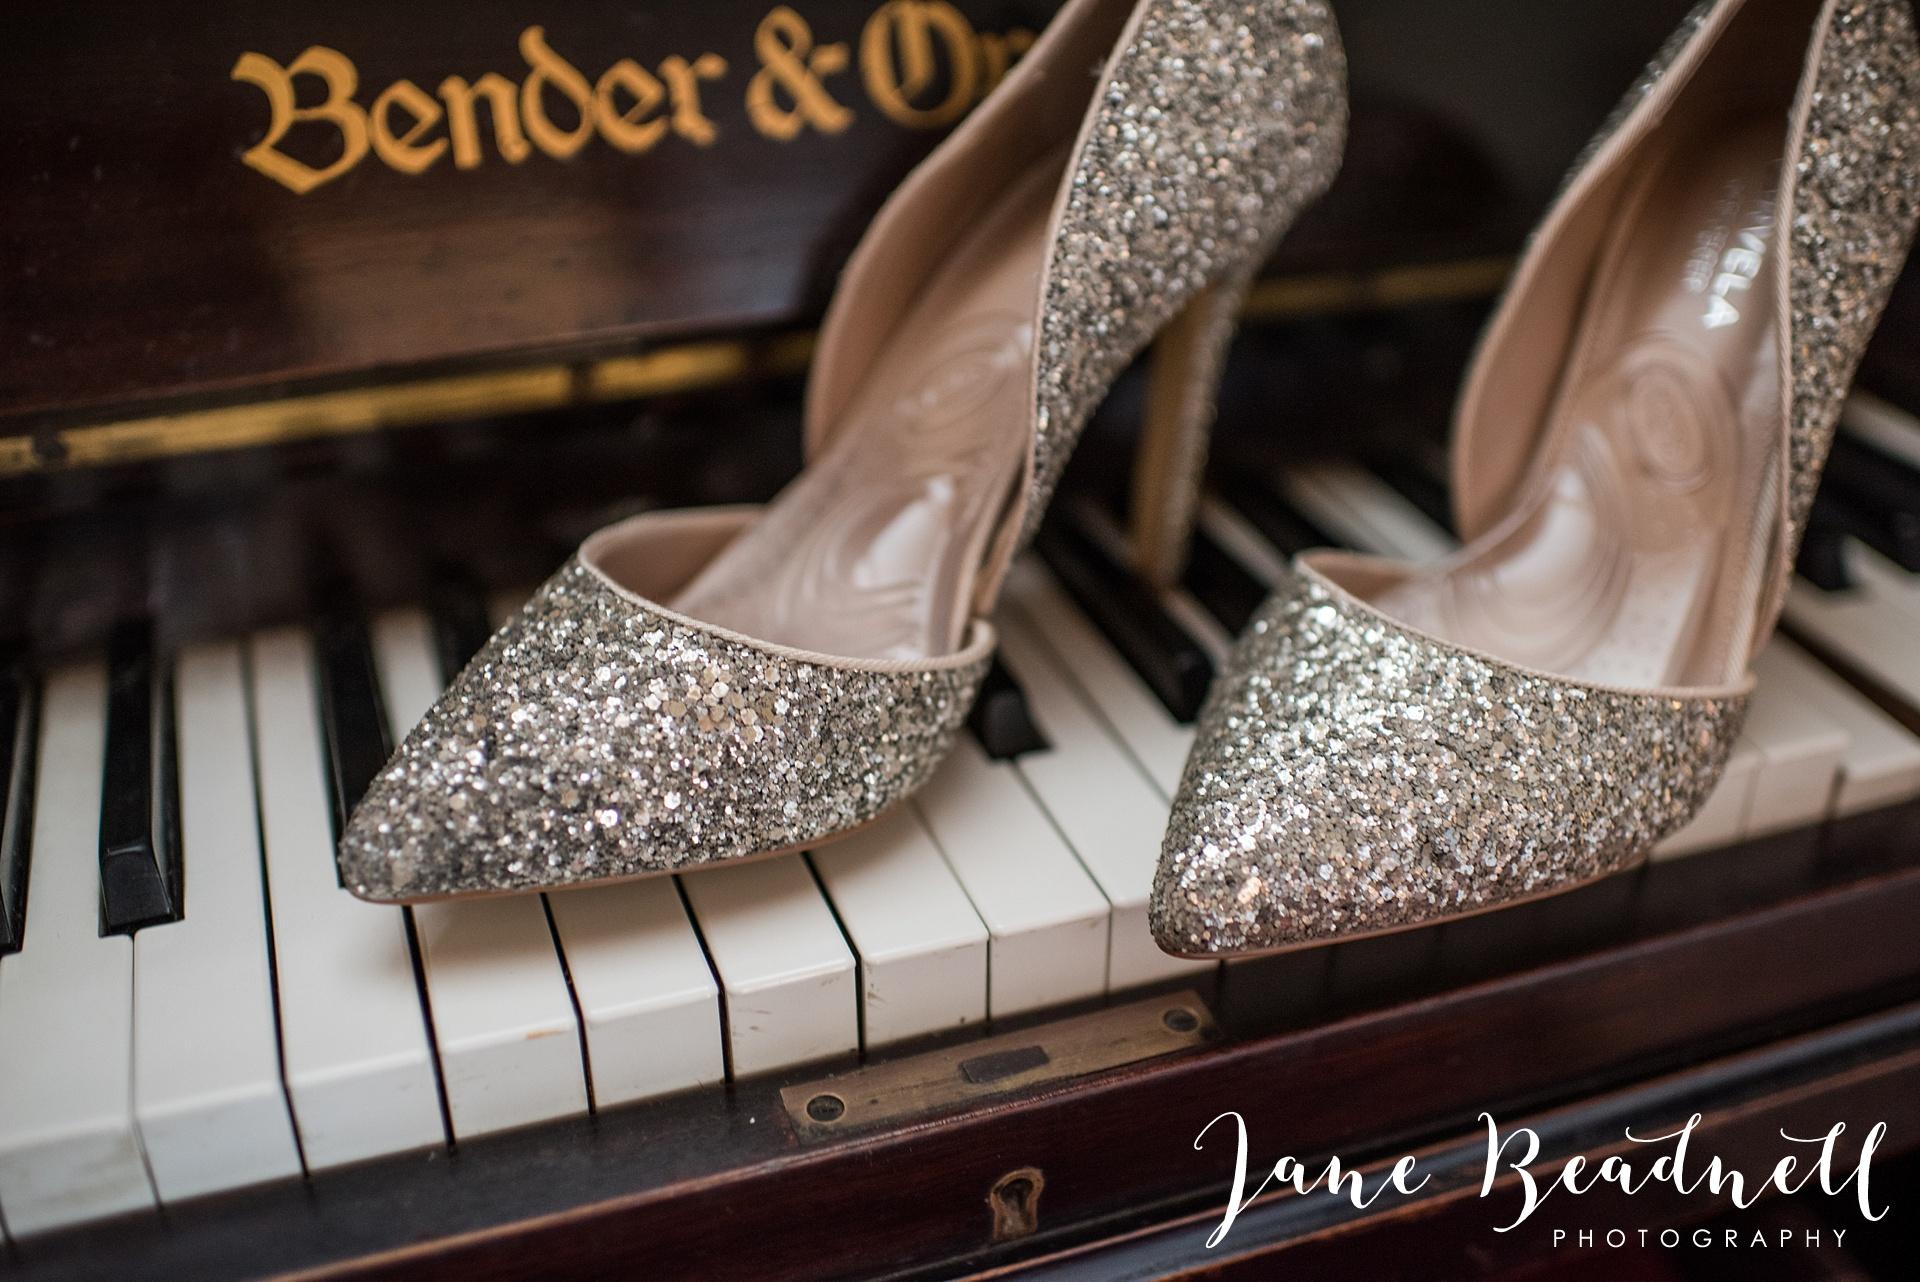 fine-art-wedding-photographer-jane-beadnell-yorkshire-wedding-photographer_0027